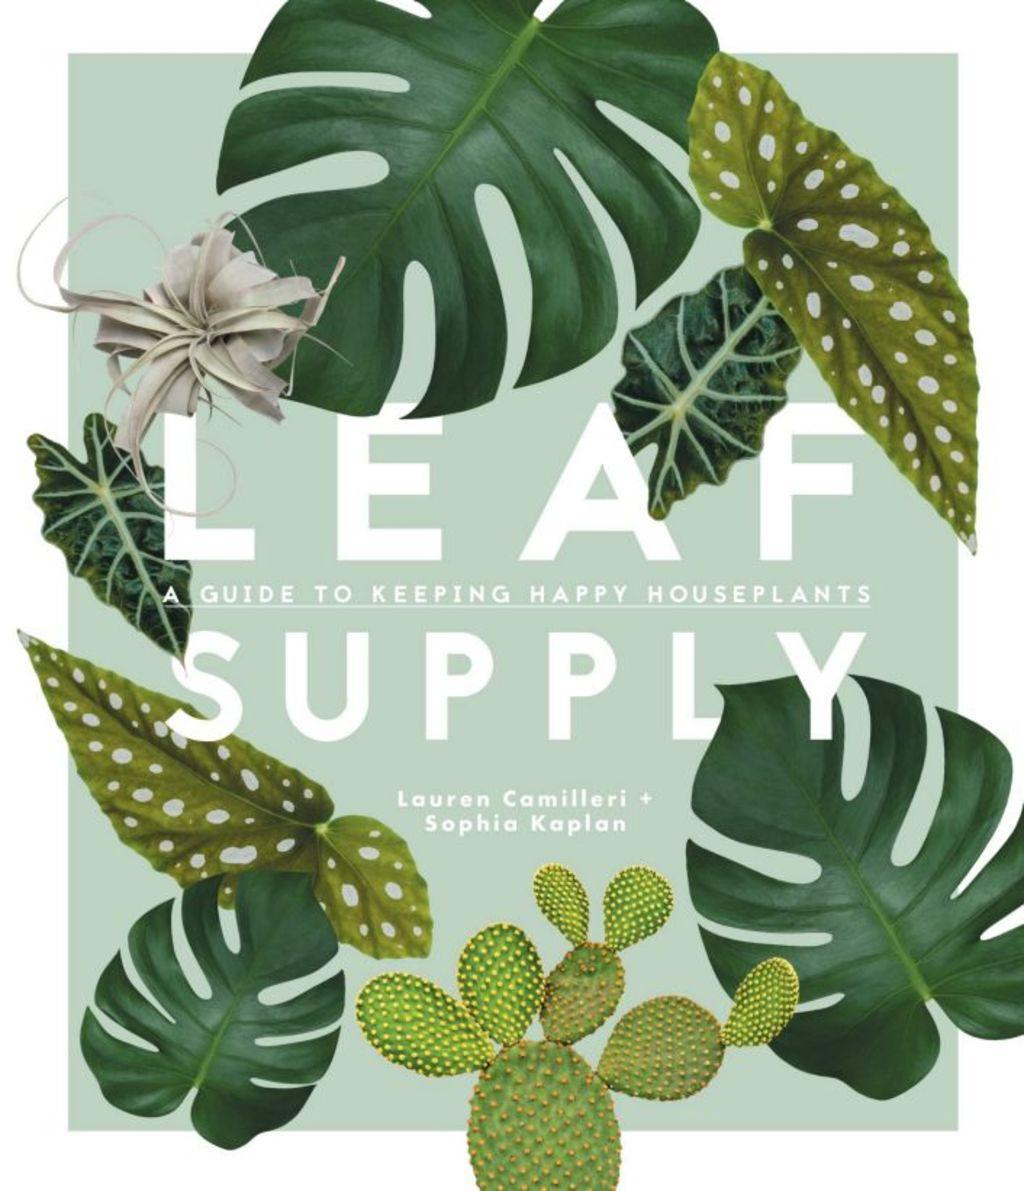 Leaf Supply offers advice on how to nurture indoor plants. Photo: Luisa Brimble